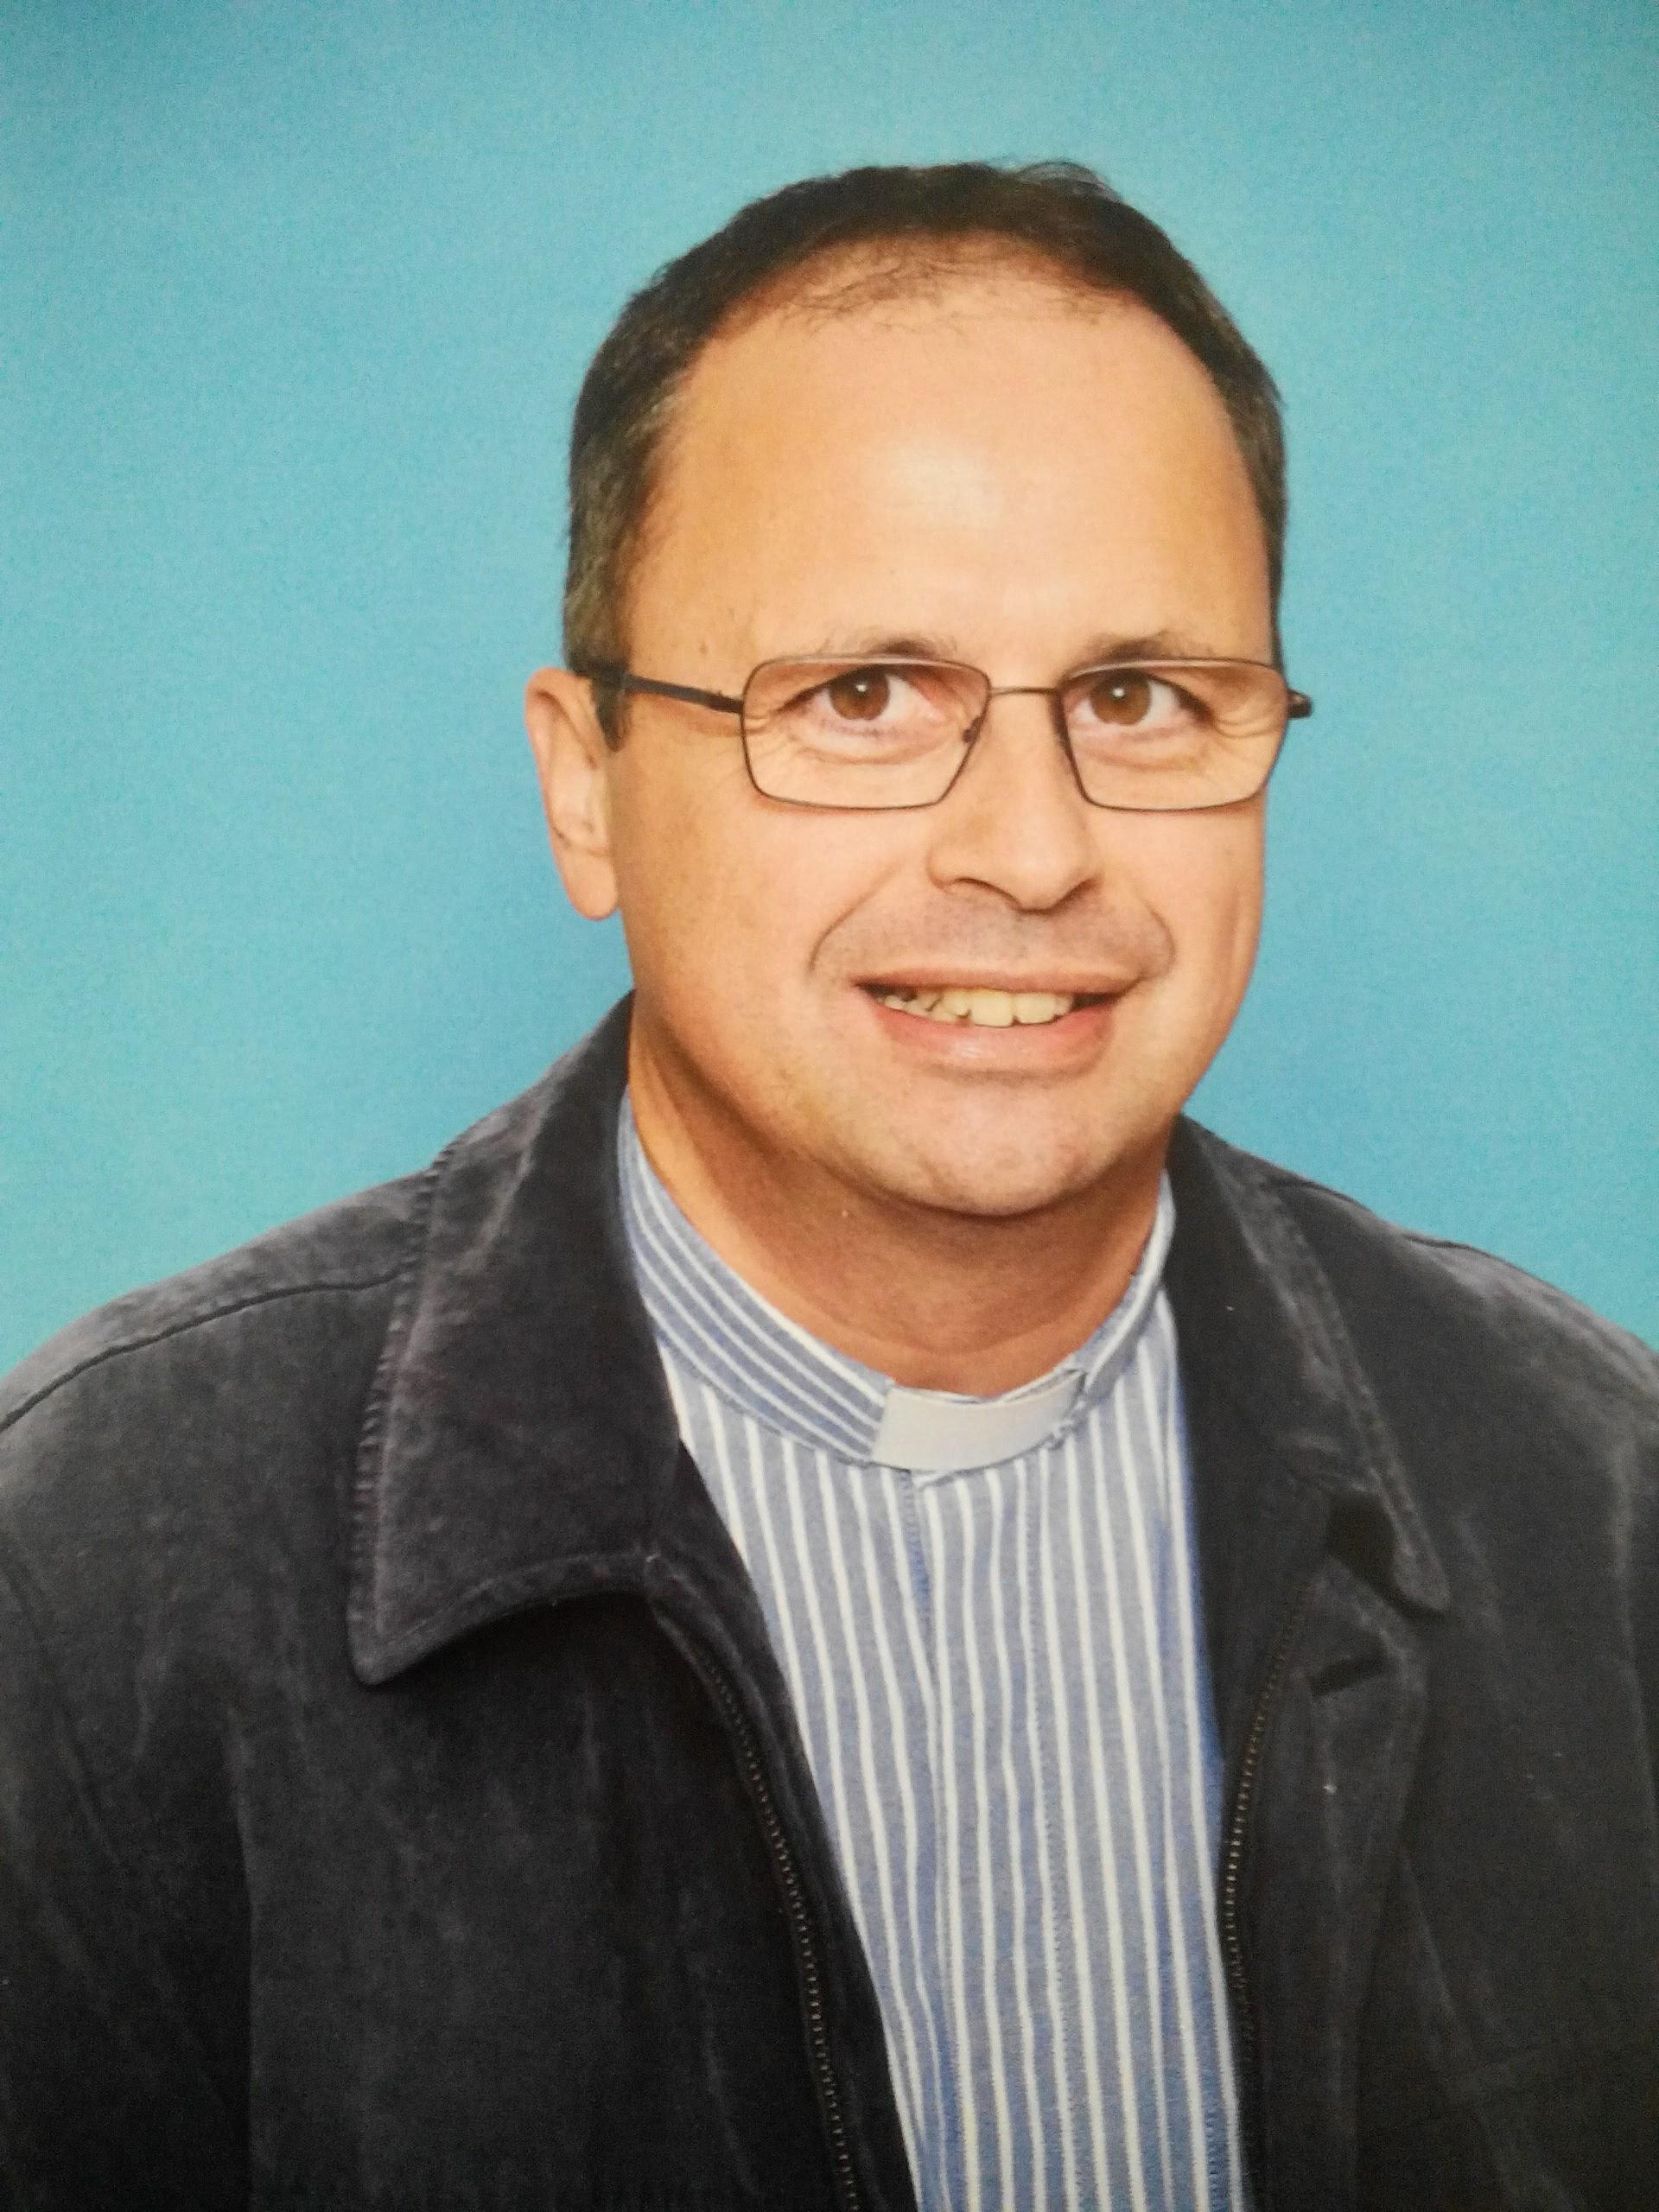 P. CARLOS ROSMANINHO